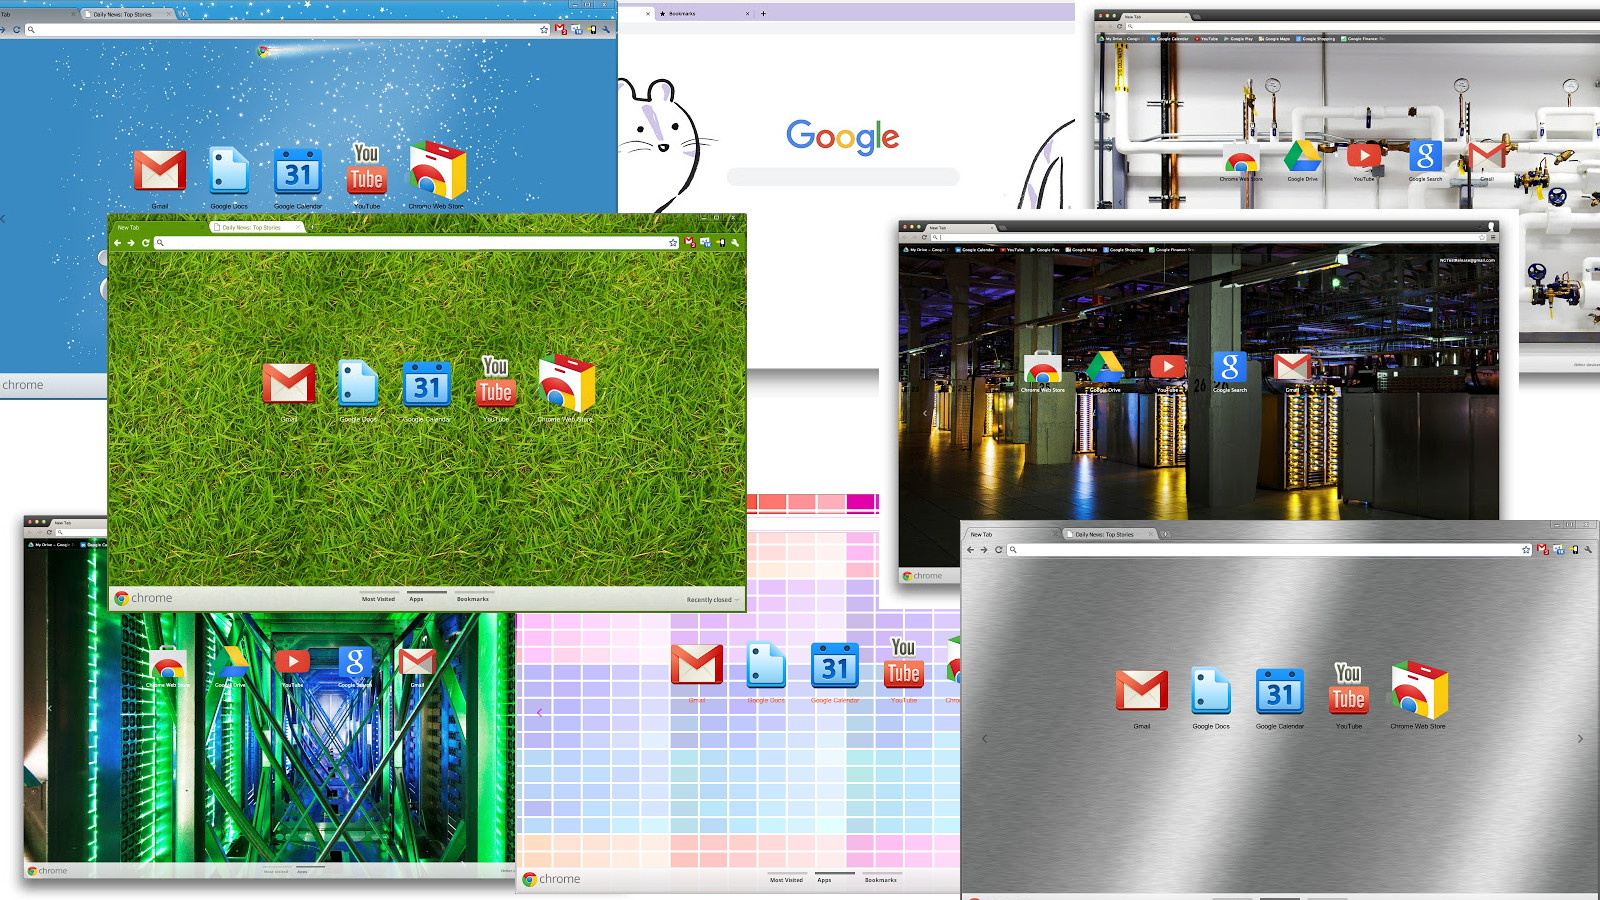 Google Chrome Design selbst erstellen: So geht's | UPDATED